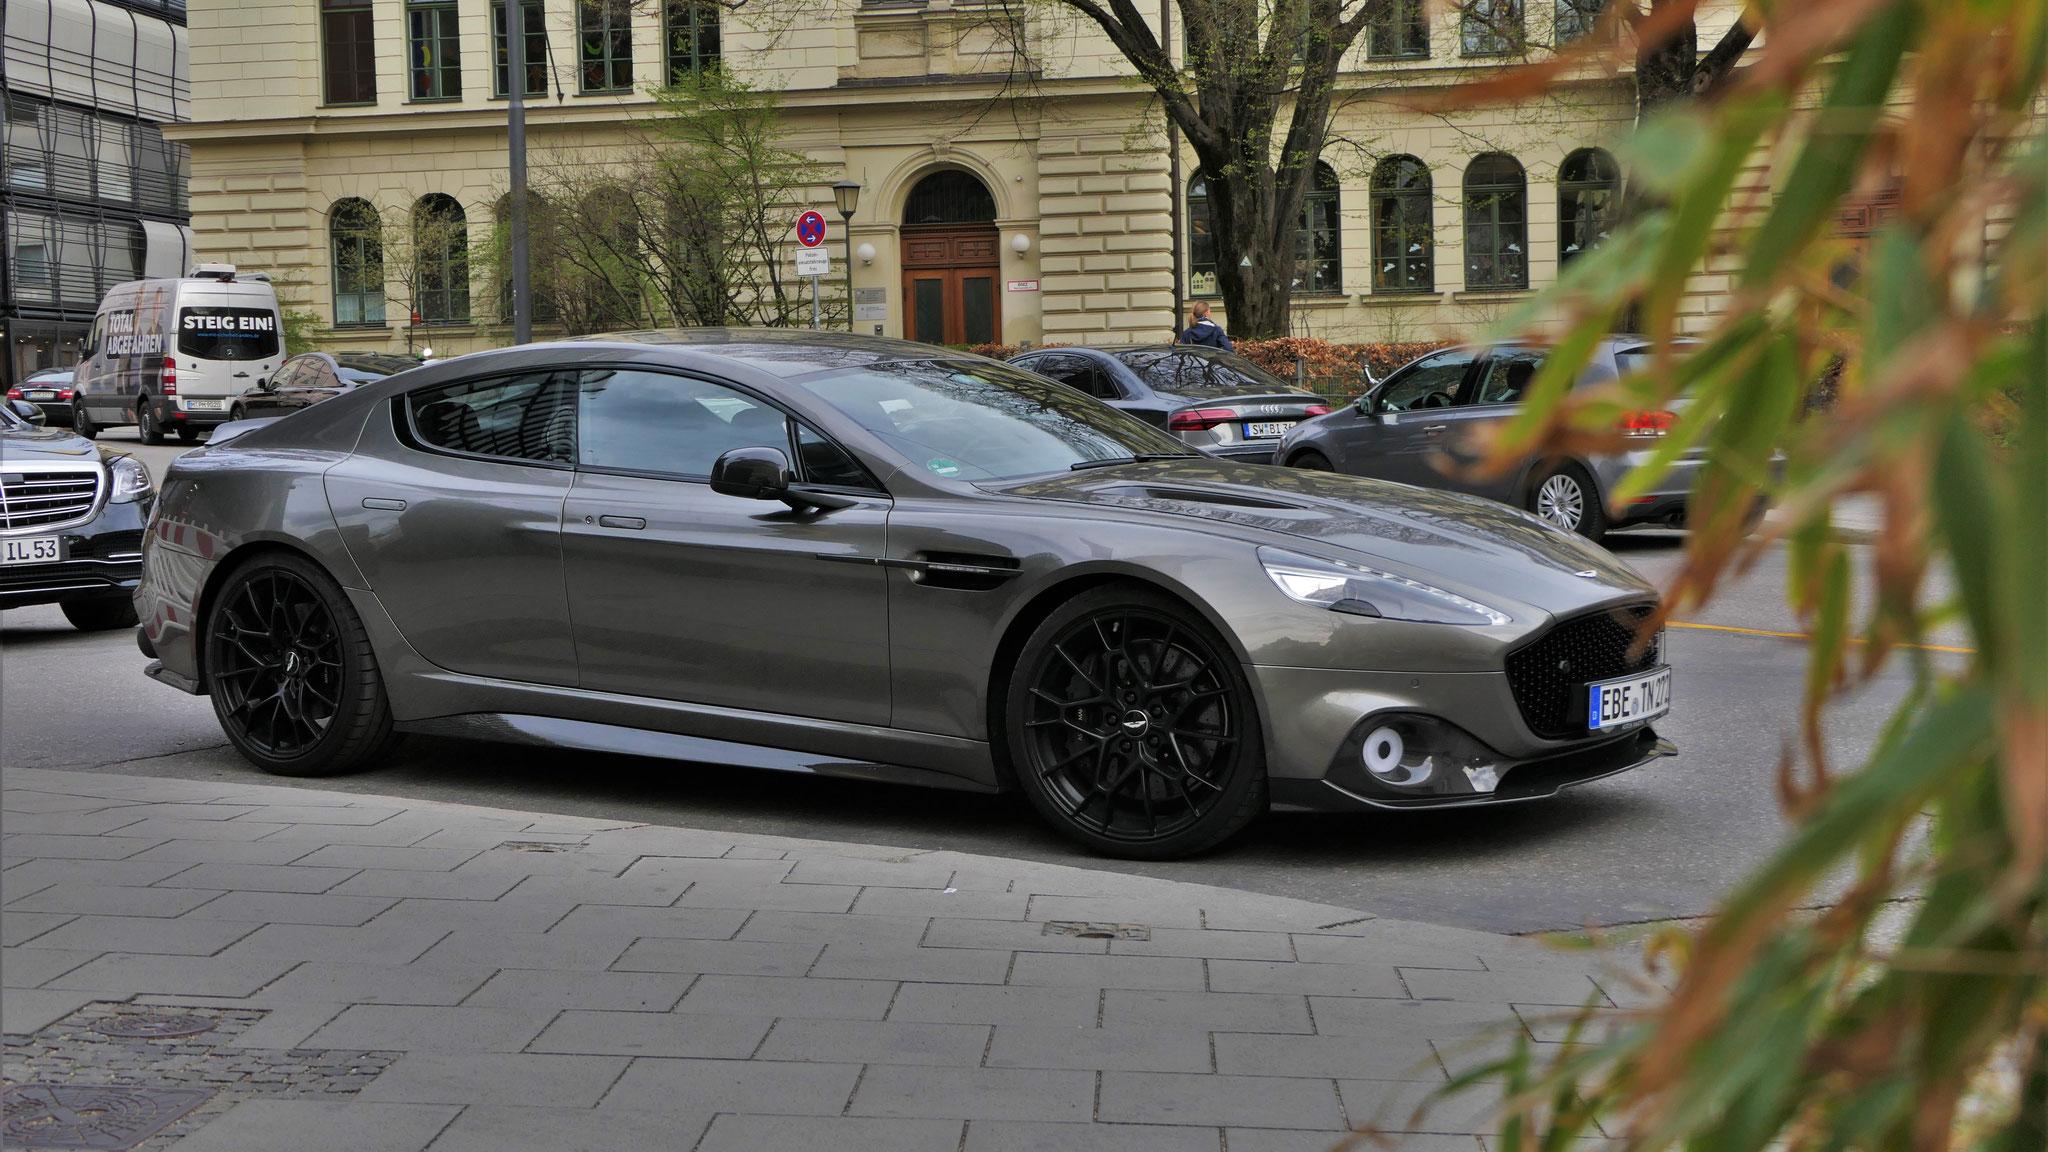 Aston Martin Rapide AMR - EBE-TN-272